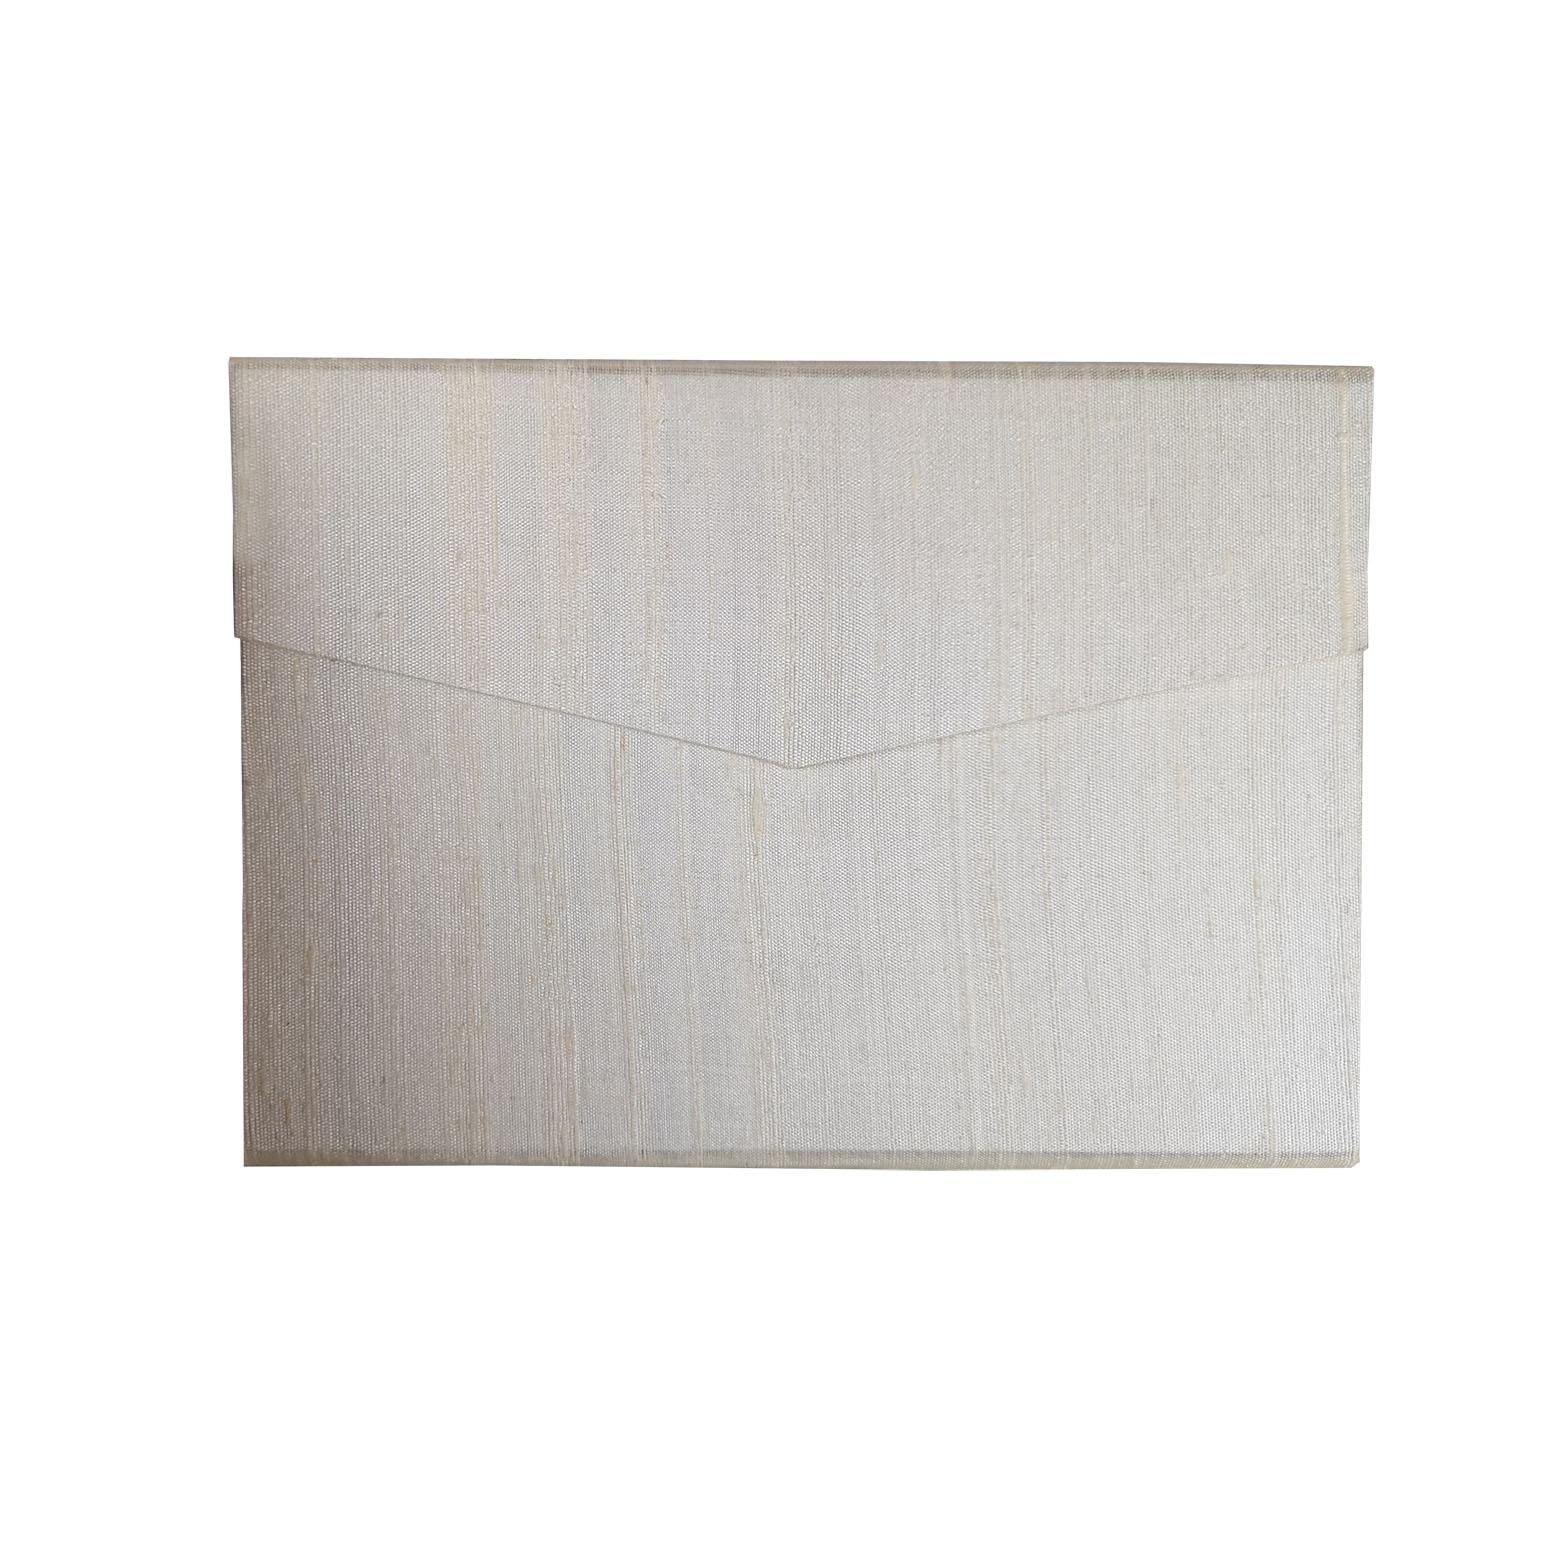 Ivory dupioni silk envelope